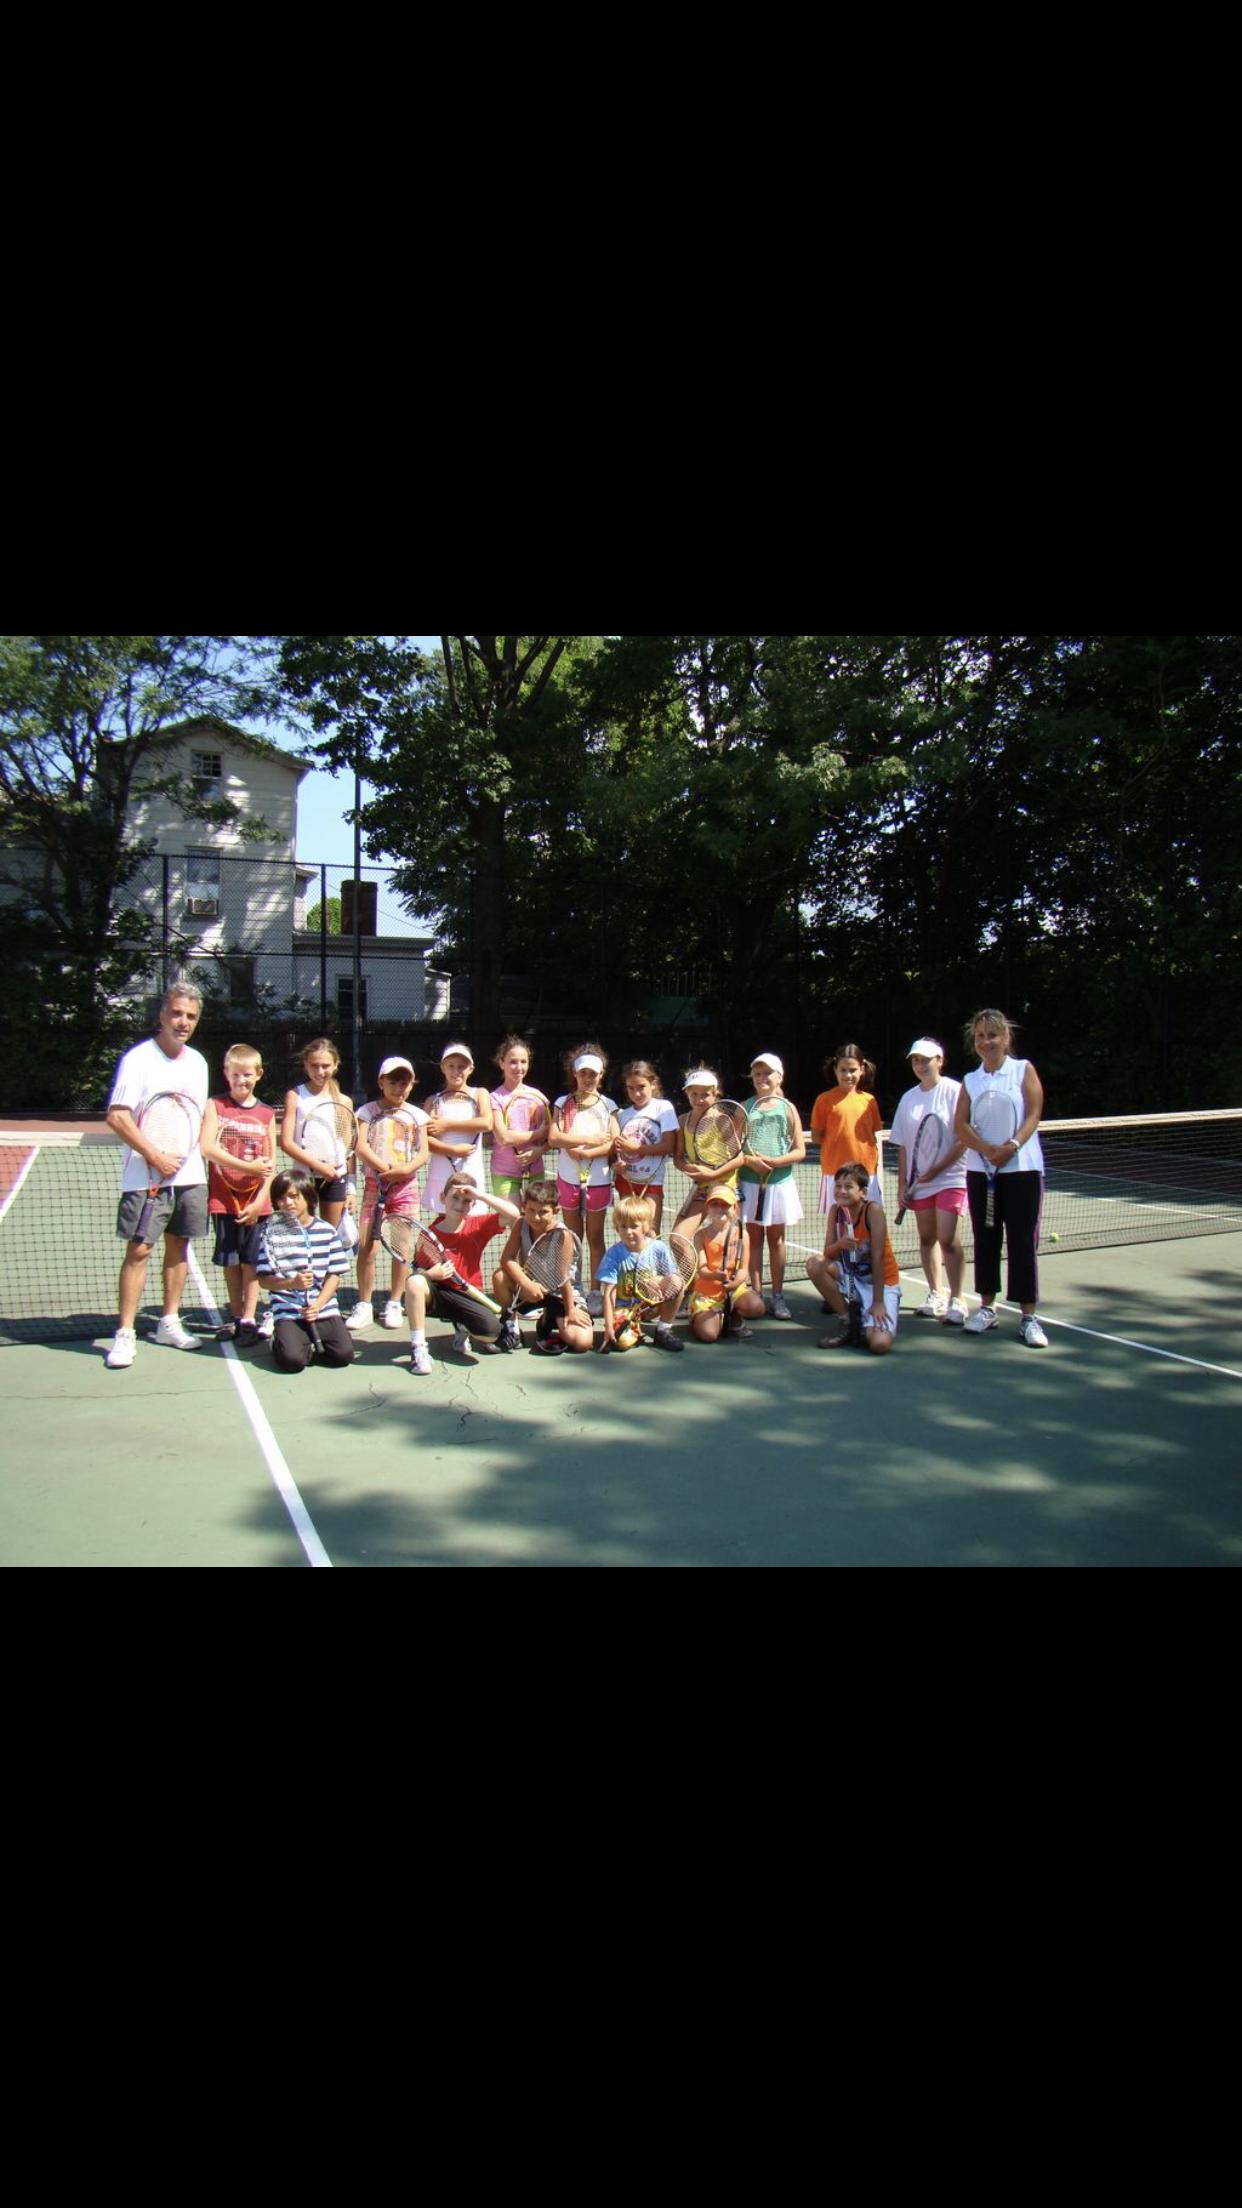 Romansky Tennis Academy